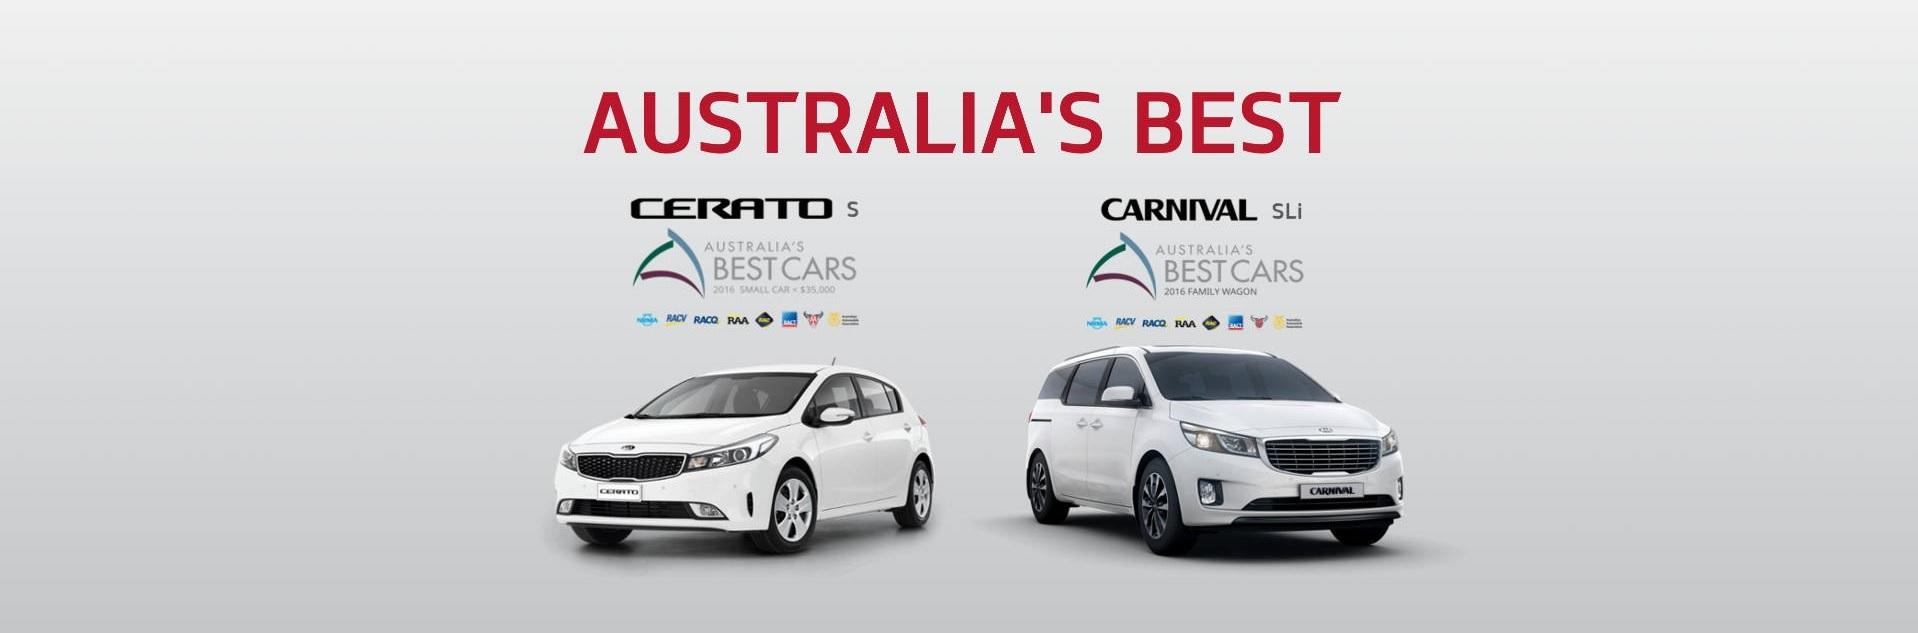 Australia Best Banner 3